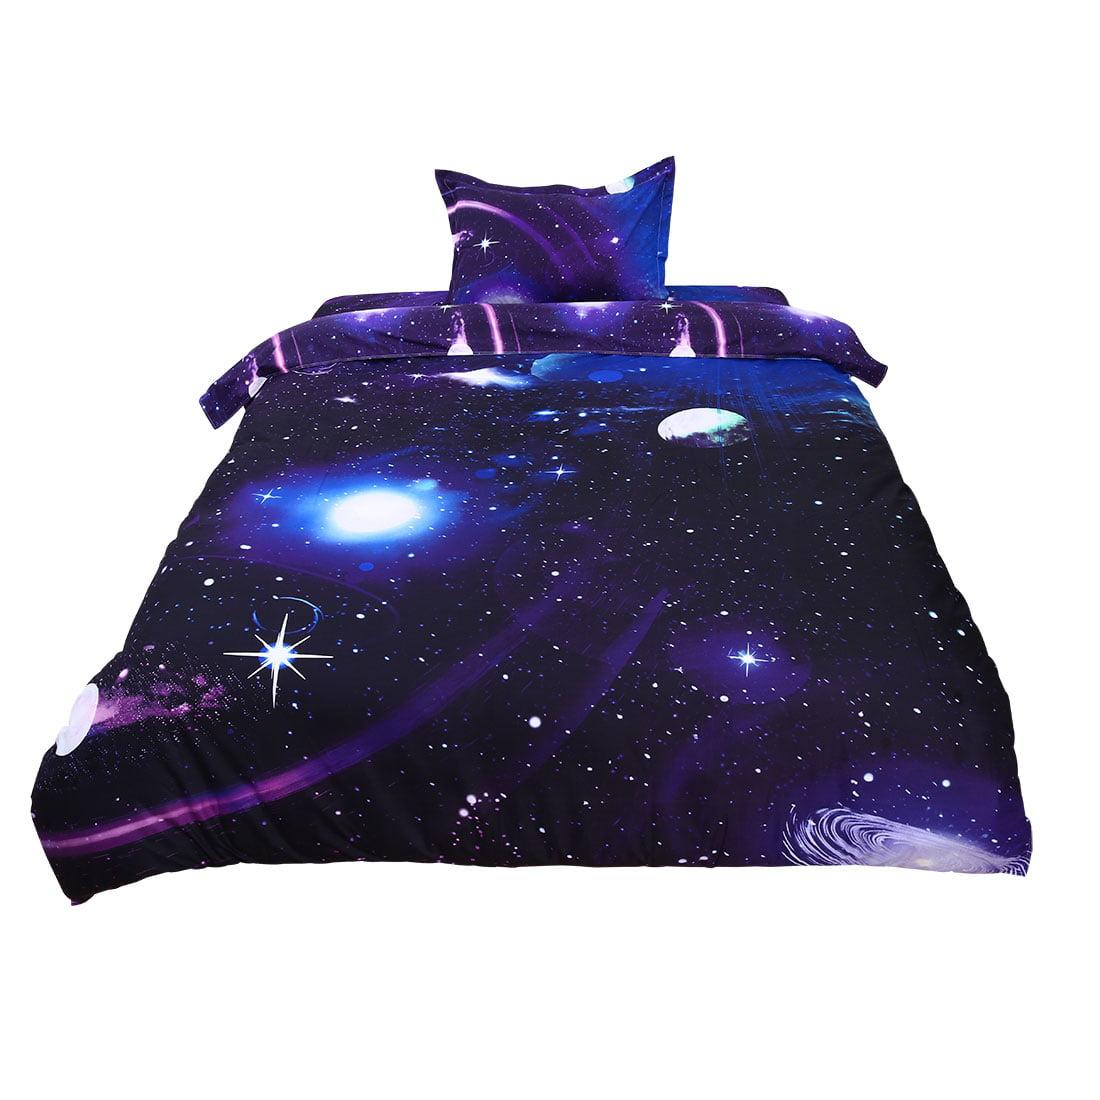 ... Galaxy Sky Cosmos Night Pattern Single Size 3pcs Bedding Duvet Set Dark Purple